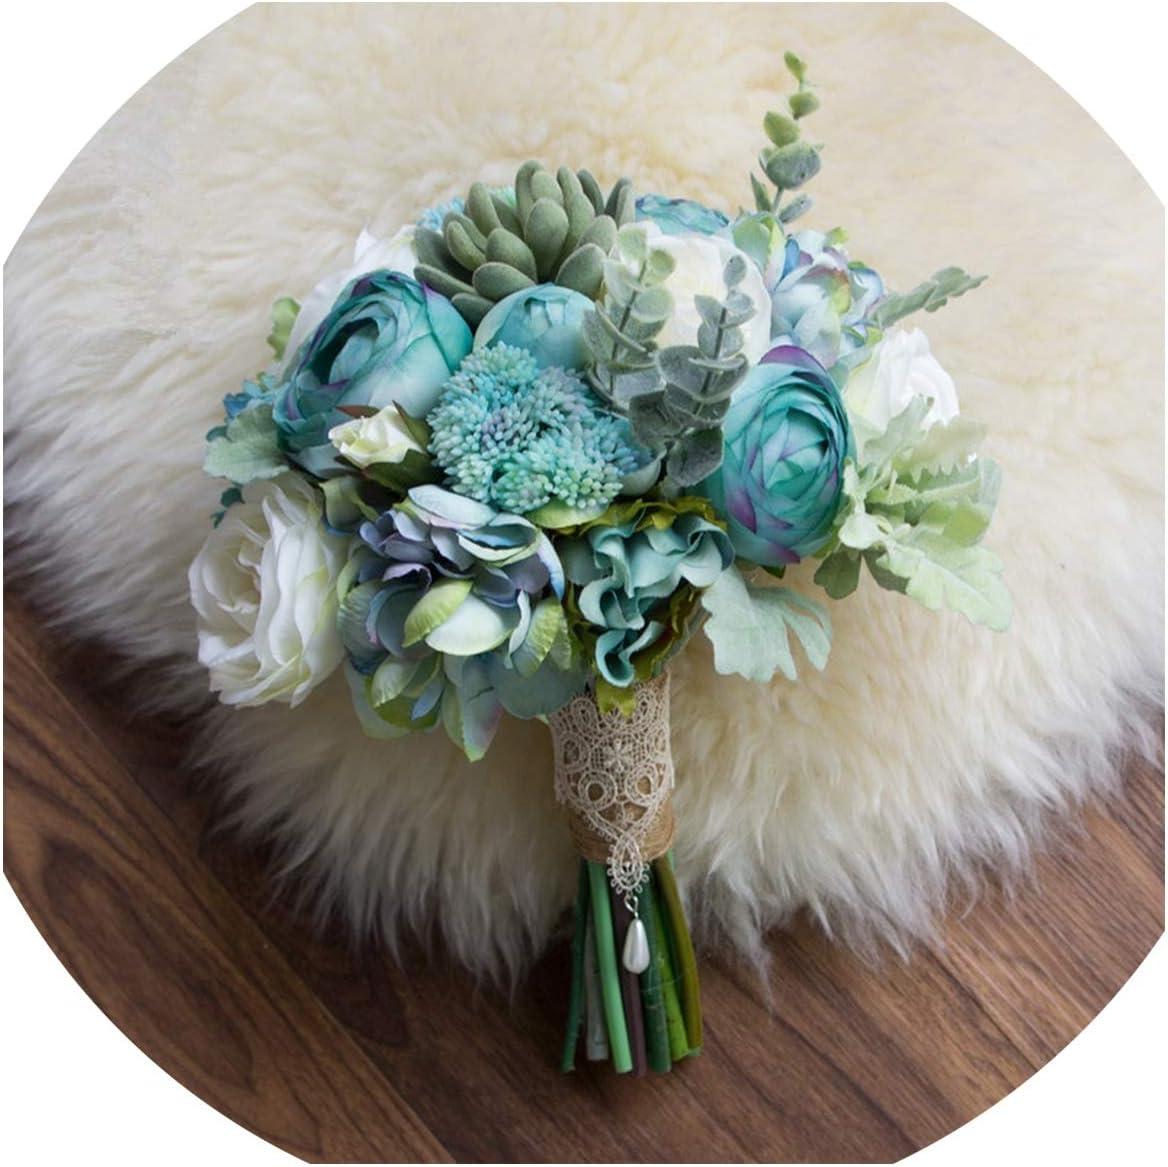 Amazon Com Paramise Ins Blue Bride Bouquet Beach Wedding Flower Bouquet Artificial Succulent Plant White Bridal Brooch Holding Flowers 2019 Tiffany Blue Kitchen Dining